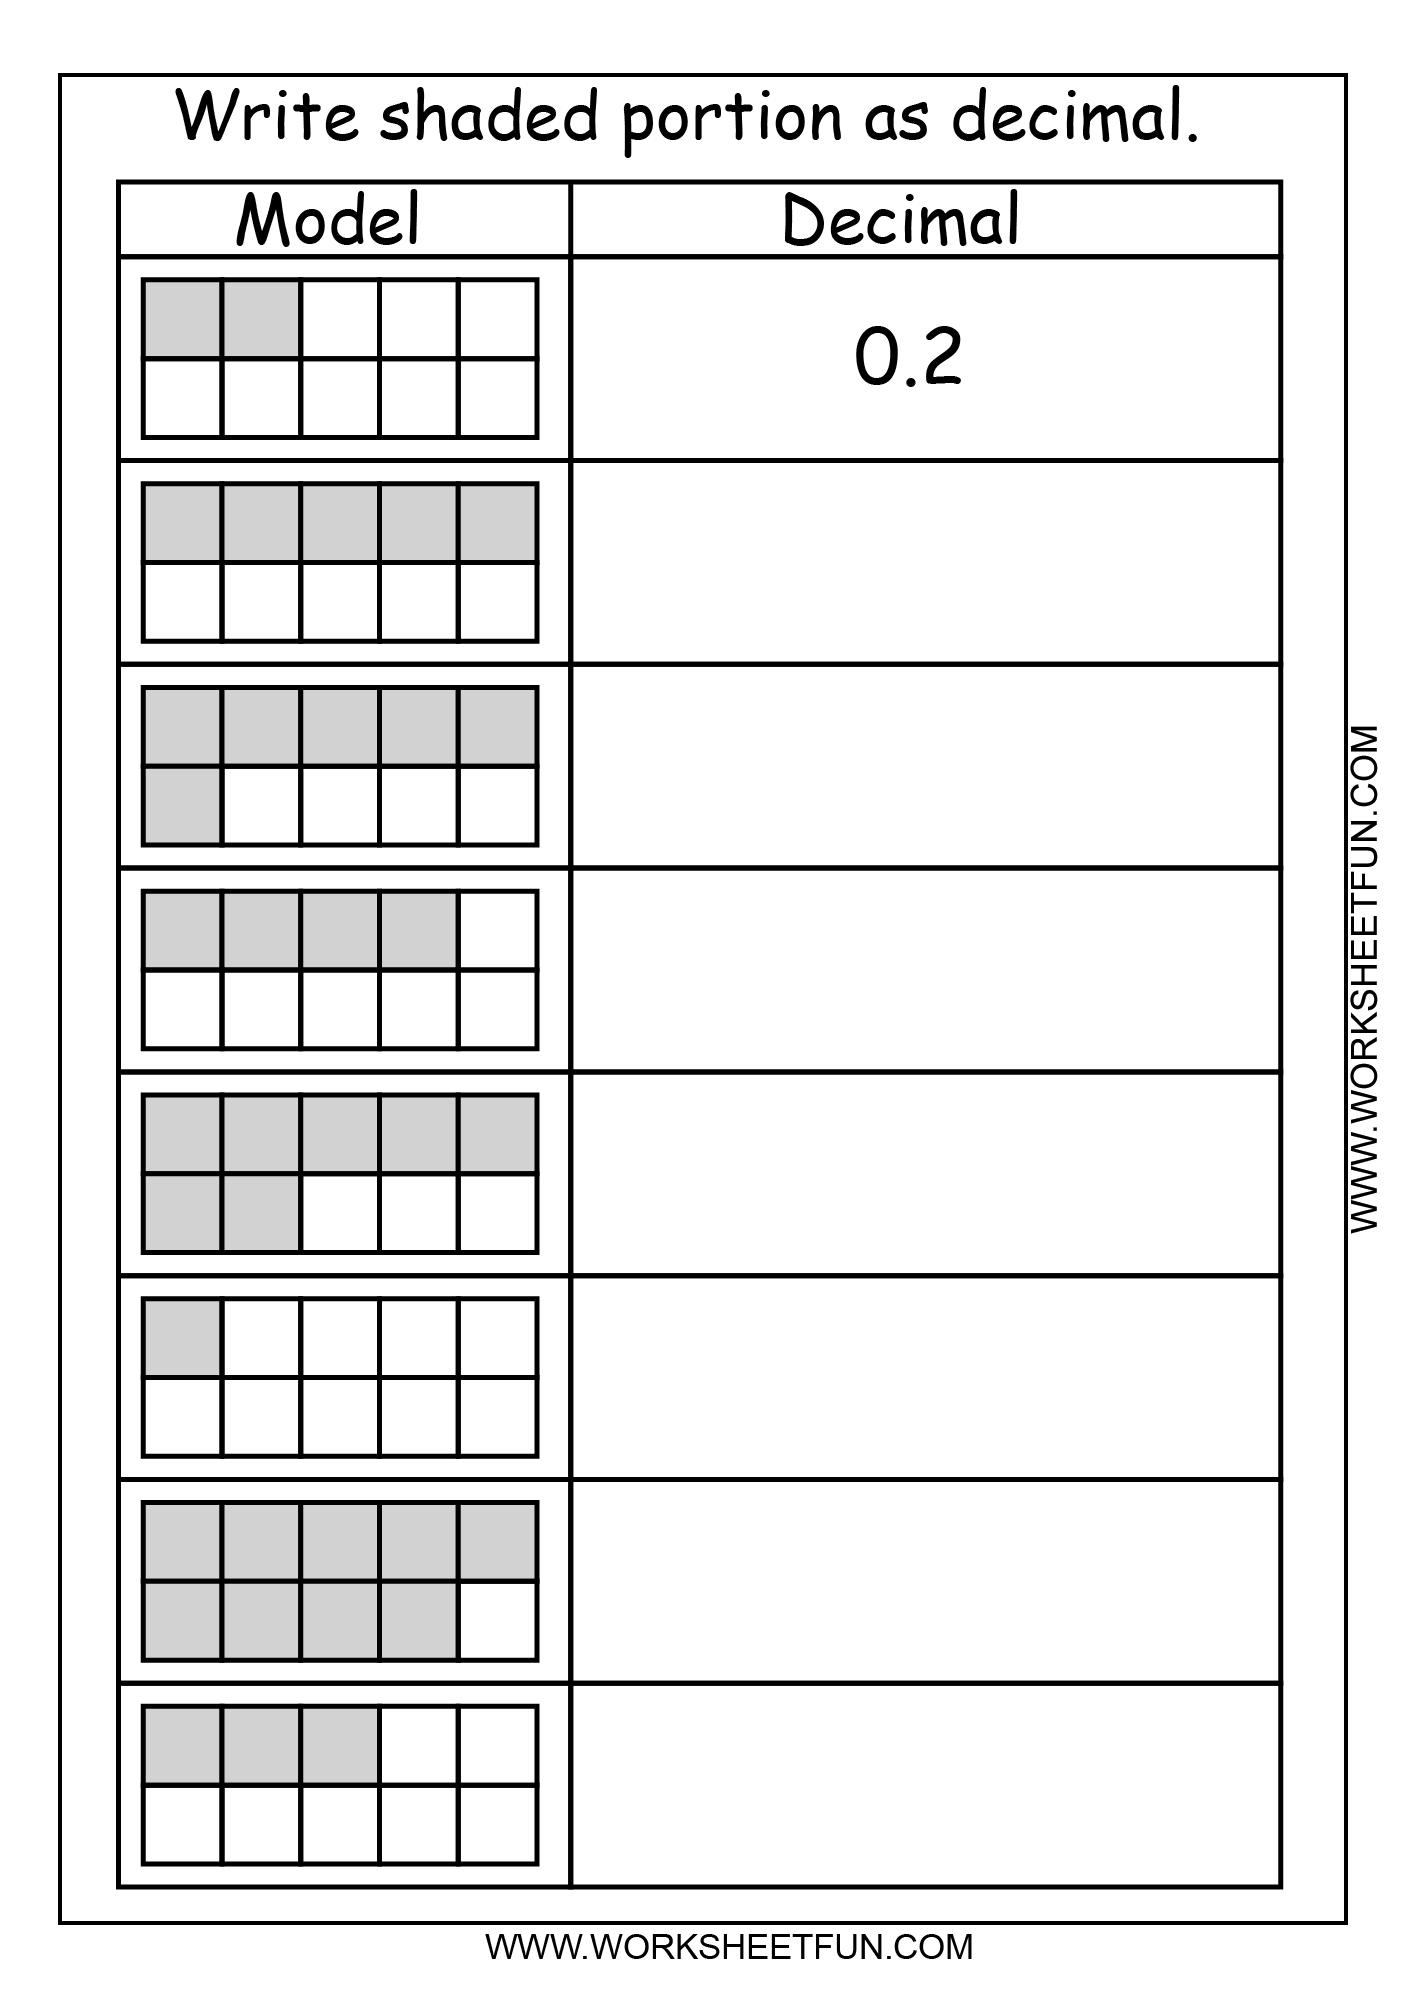 Model Decimal | Printable Worksheets | Math, Teaching Math, Math | Fractions To Decimal Worksheets Printable